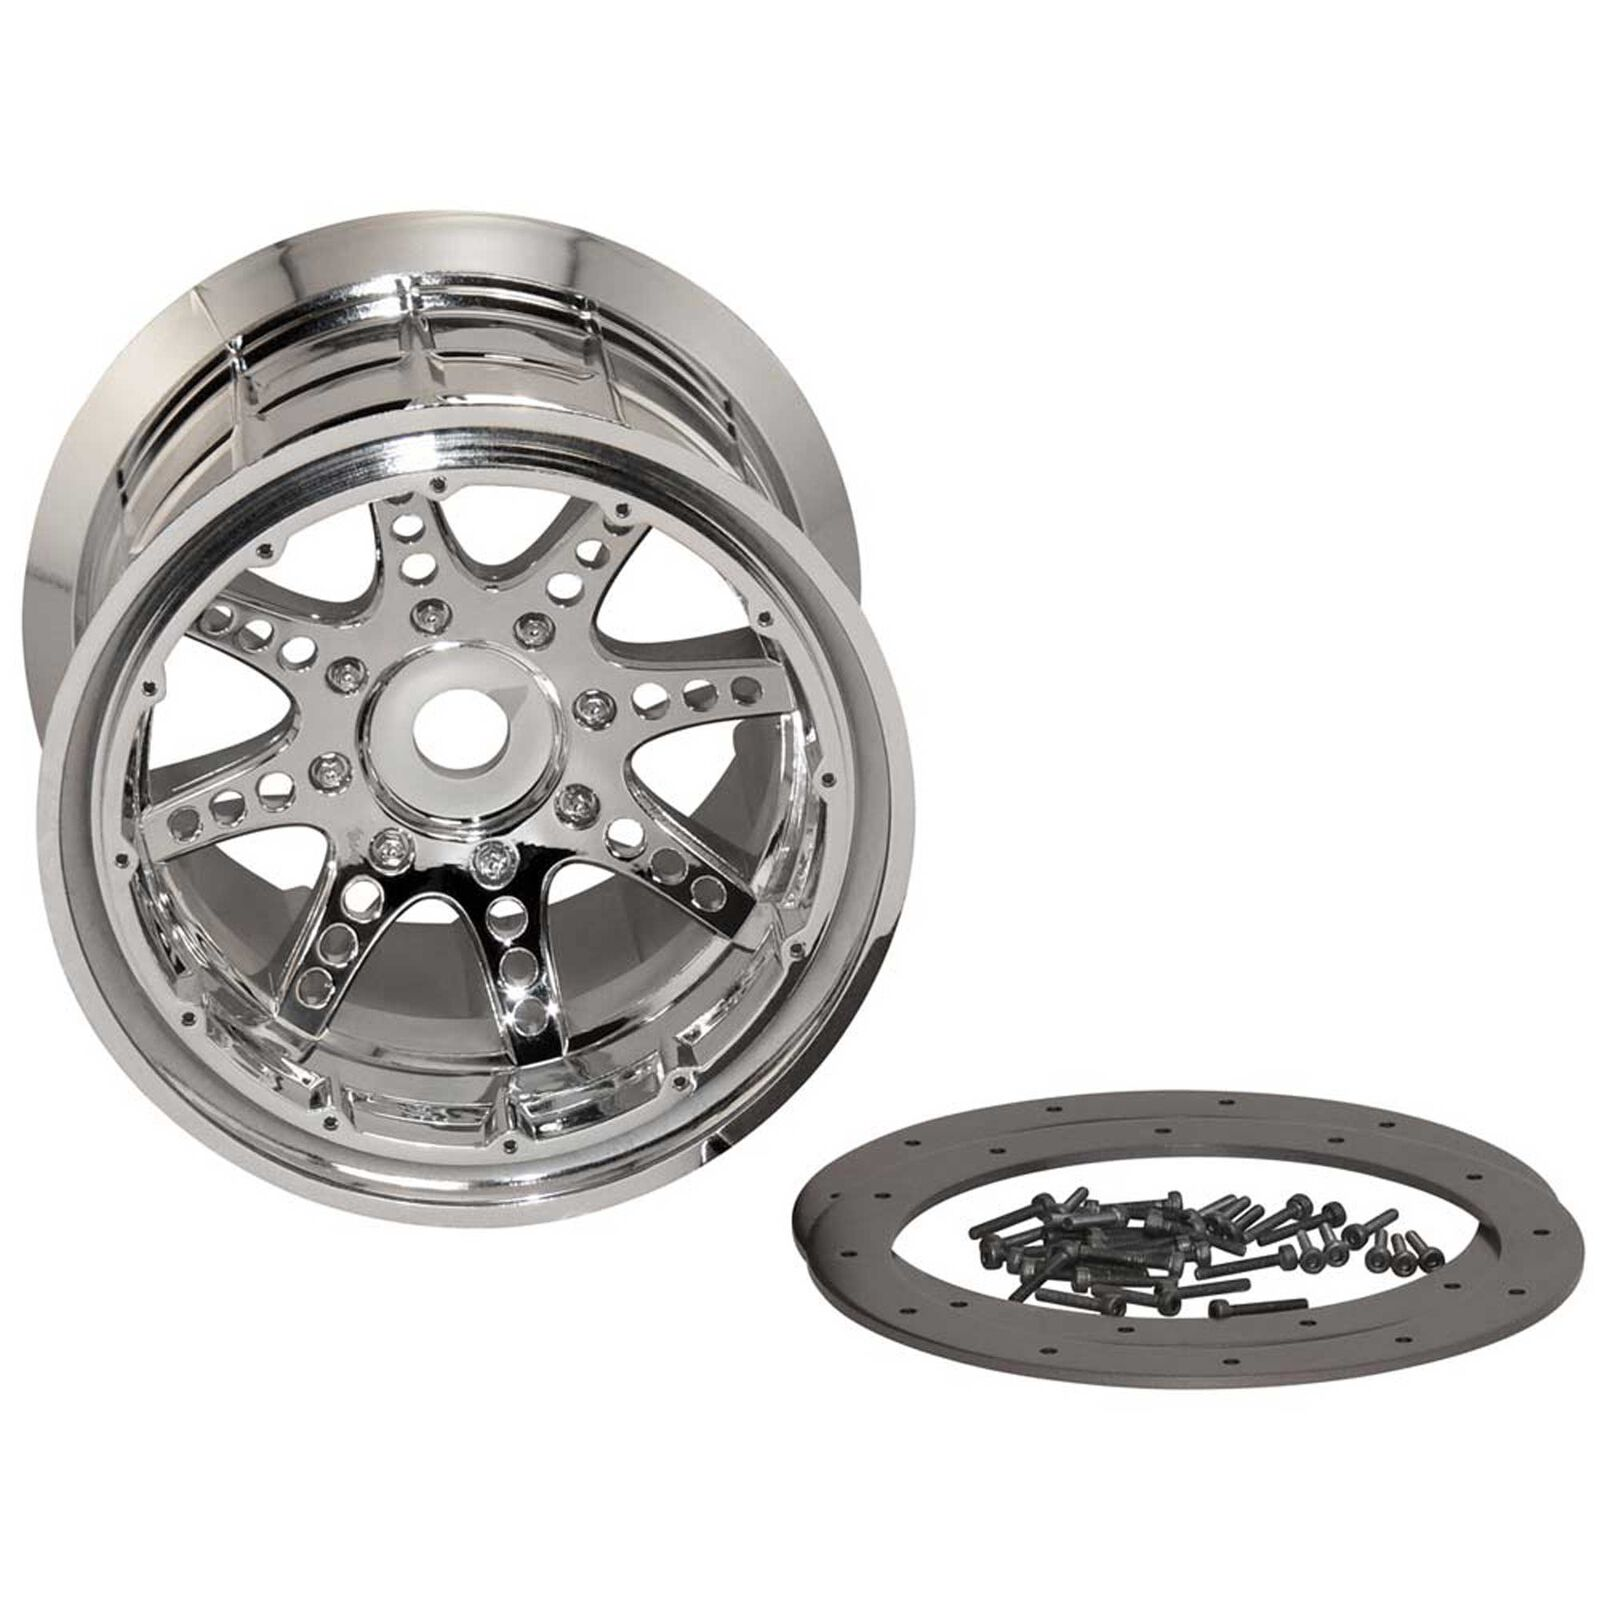 1/8 Oversize 8-Spoke 3.8 Beadlock Wheels, 17mm Hex, Chrome (2)